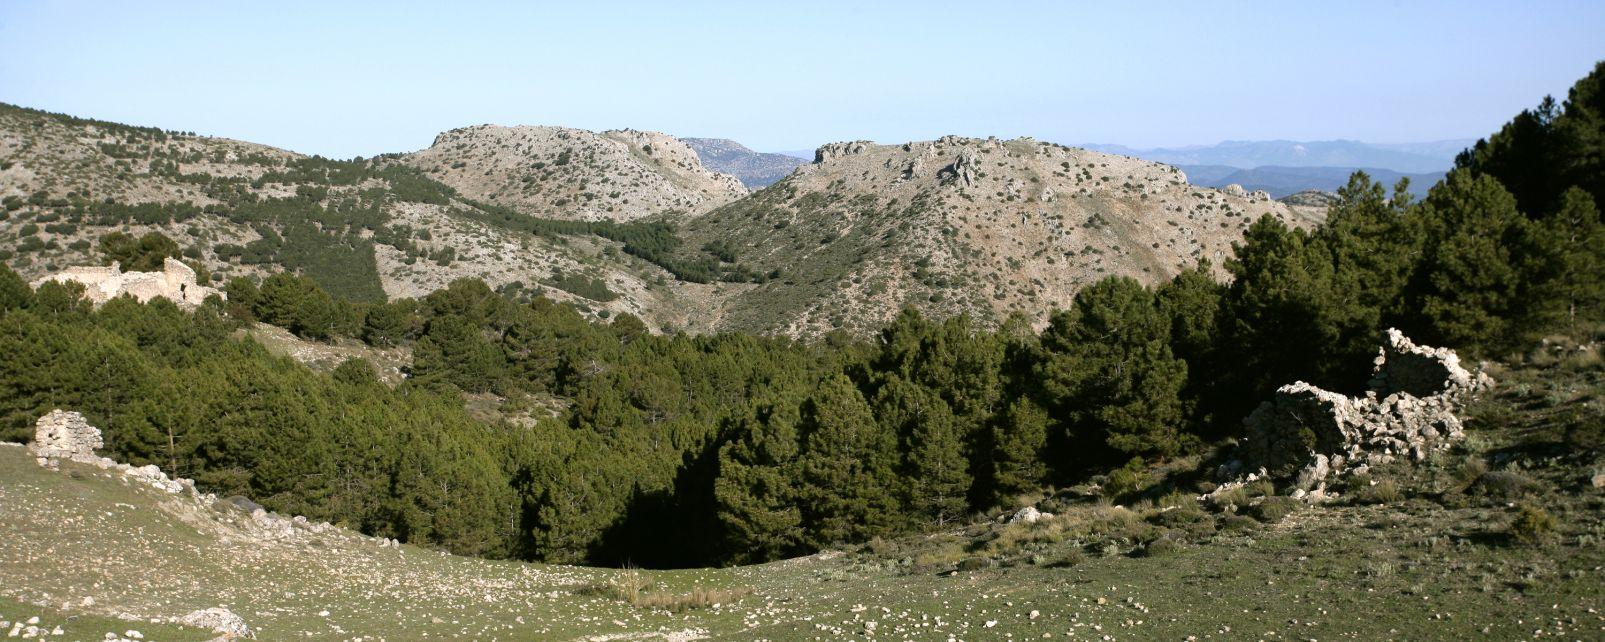 Reserva Regional Sierra Espuña, Murcia, Sierra Espuña, Fauna y flora, Murcia